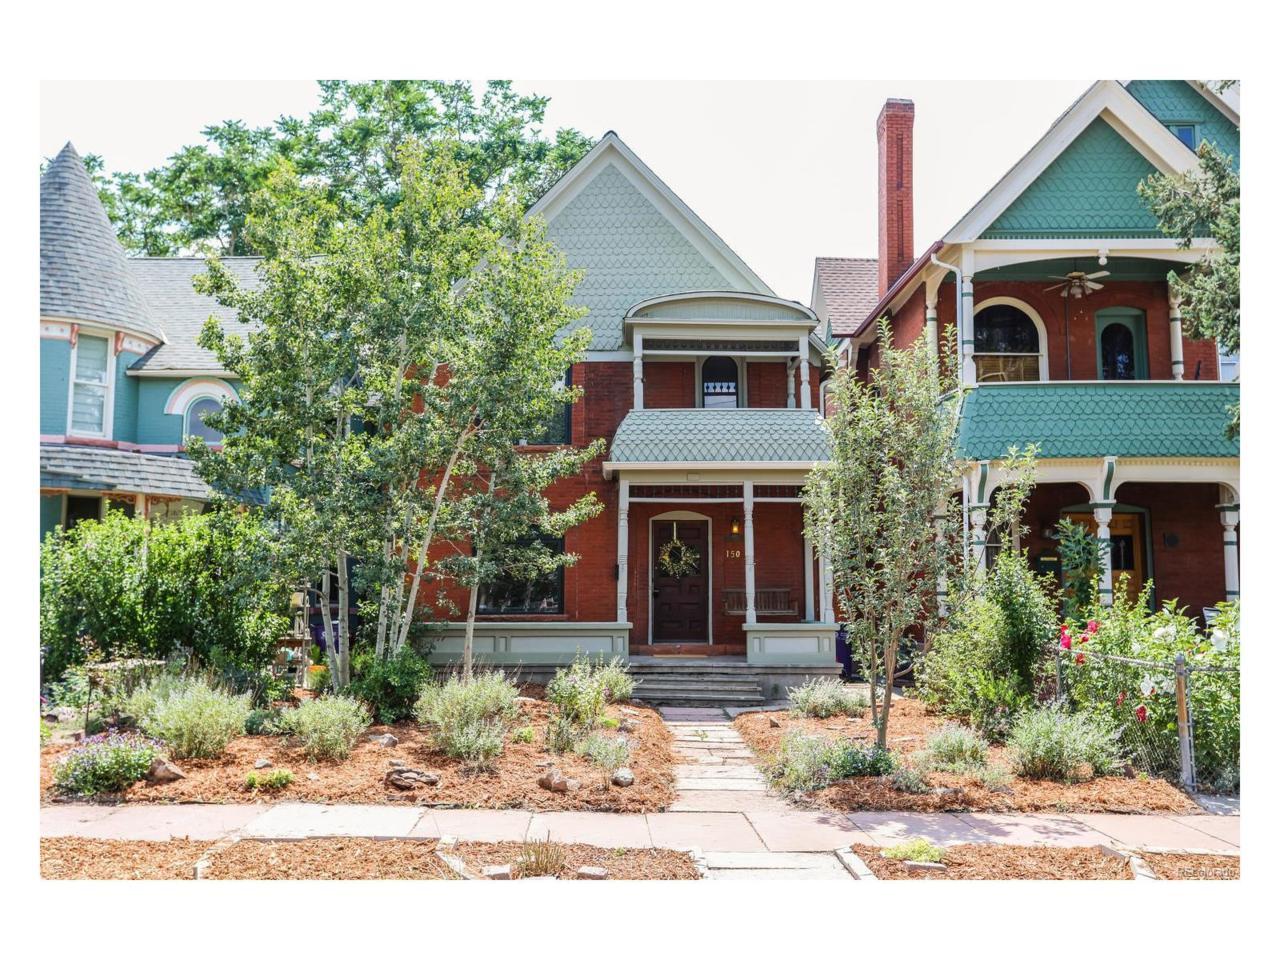 150 W 3rd Avenue, Denver, CO 80223 (MLS #6297039) :: 8z Real Estate